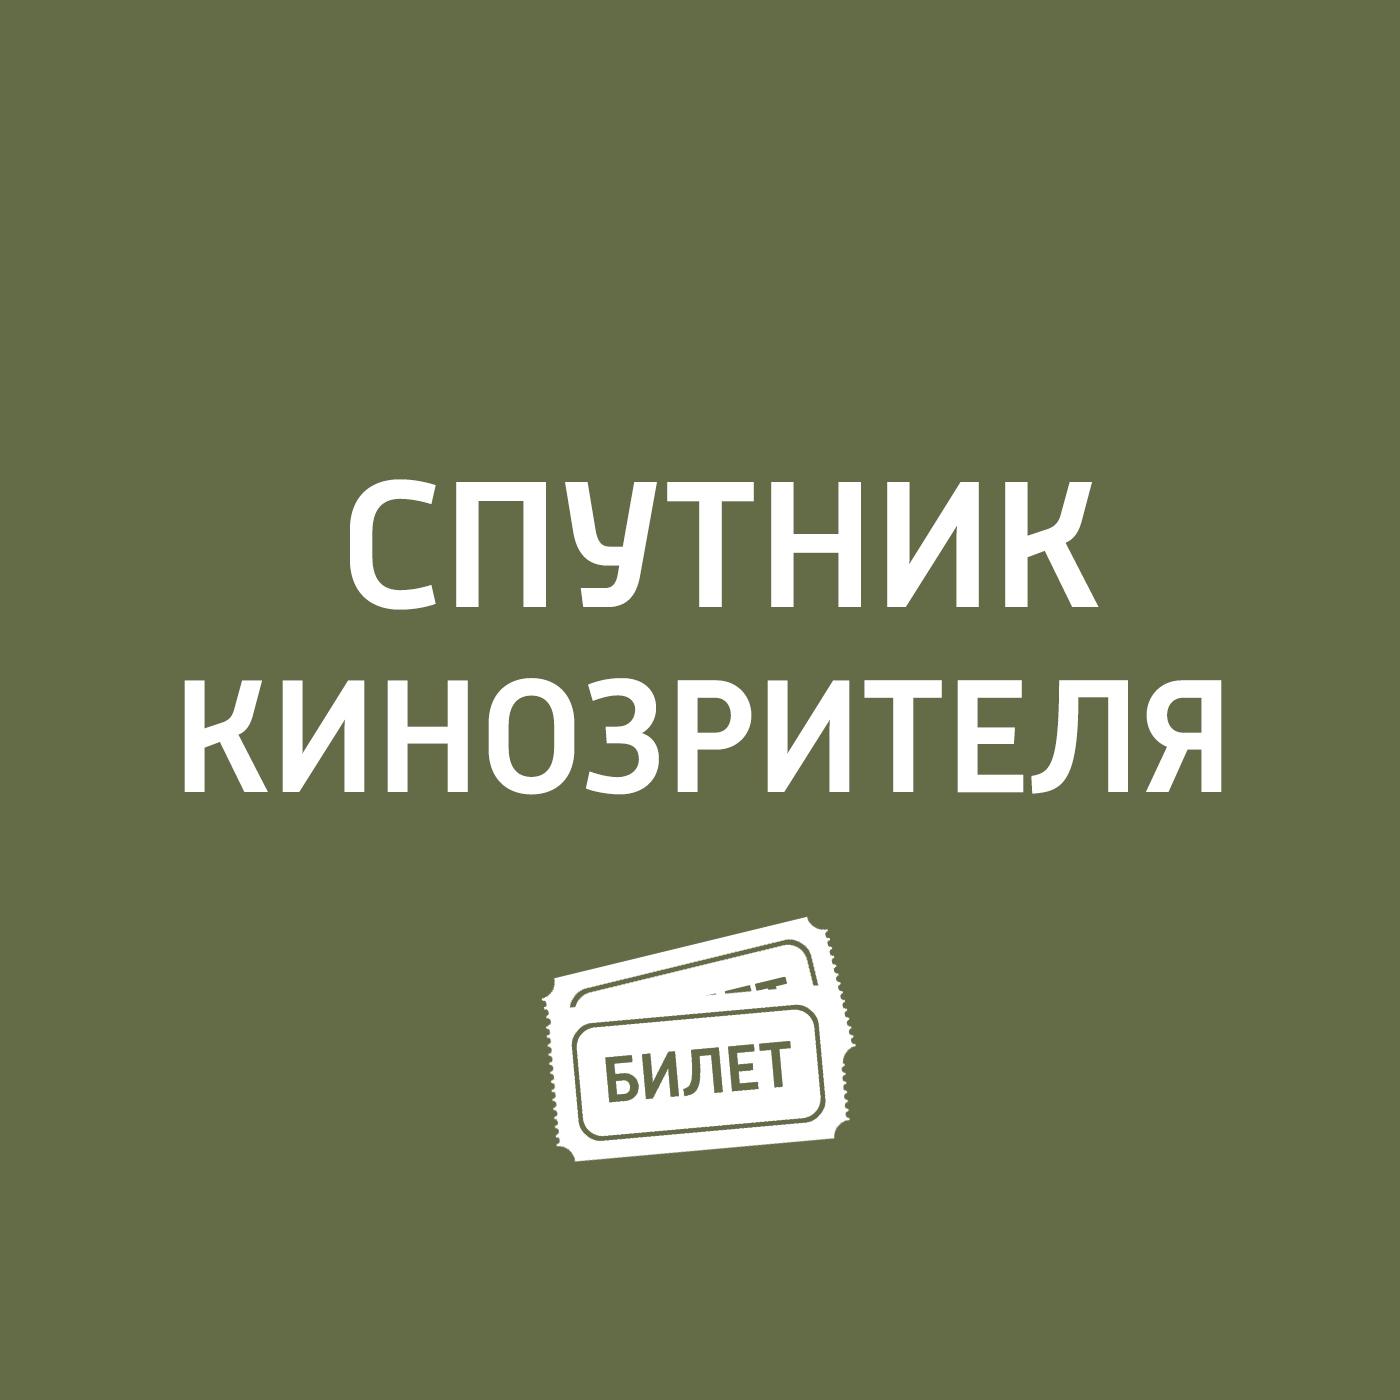 Антон Долин Кинотавр 2017 антон долин кинотавр 2017